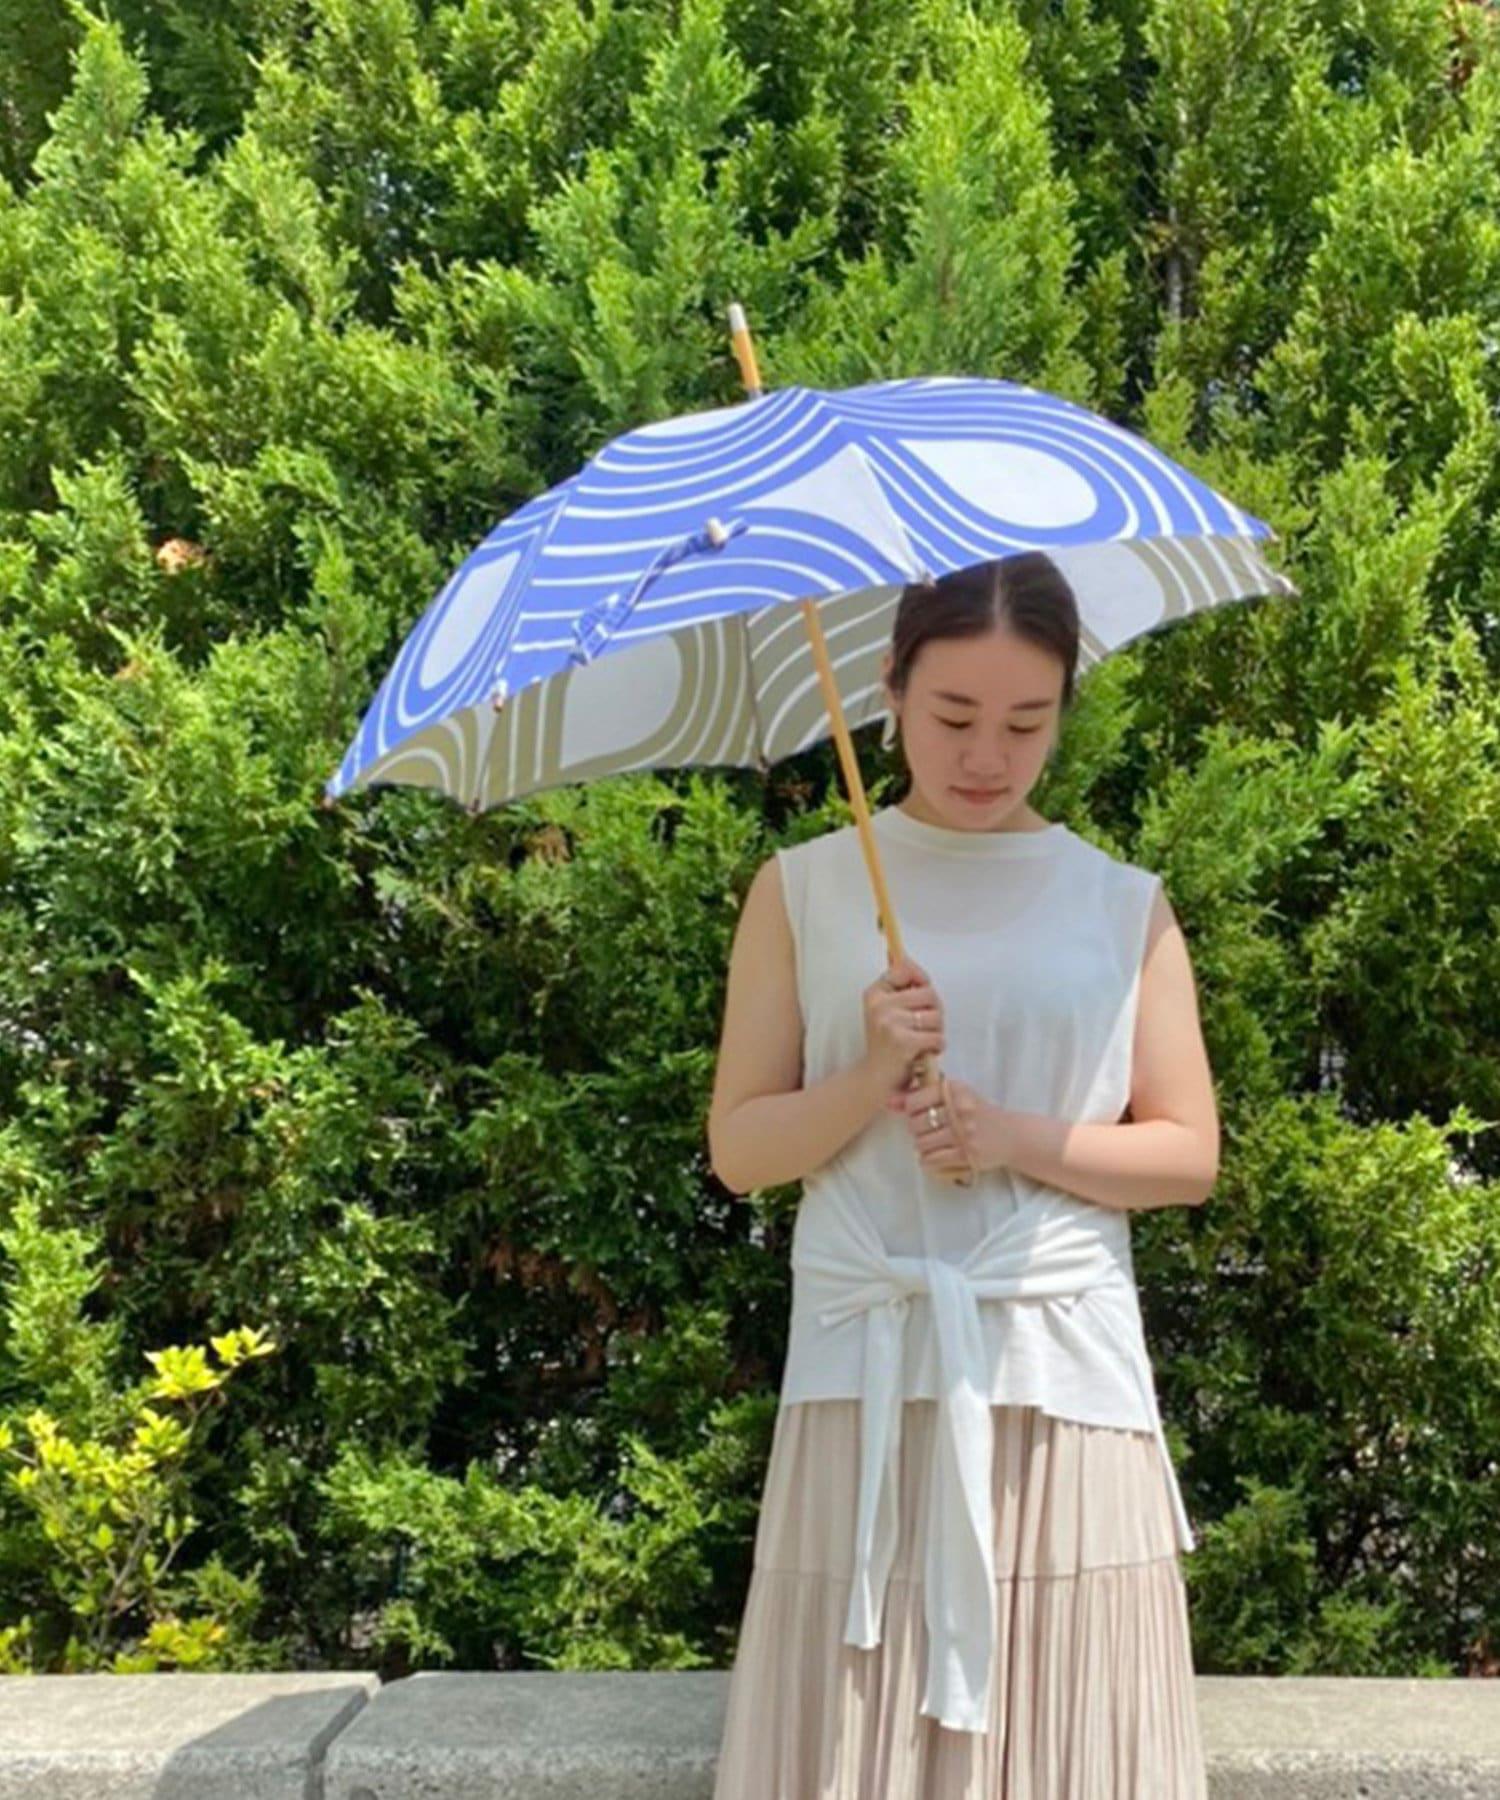 BONbazaar(ボンバザール) 《晴雨兼用》【breezy blue】両面捺染パラソル 長傘